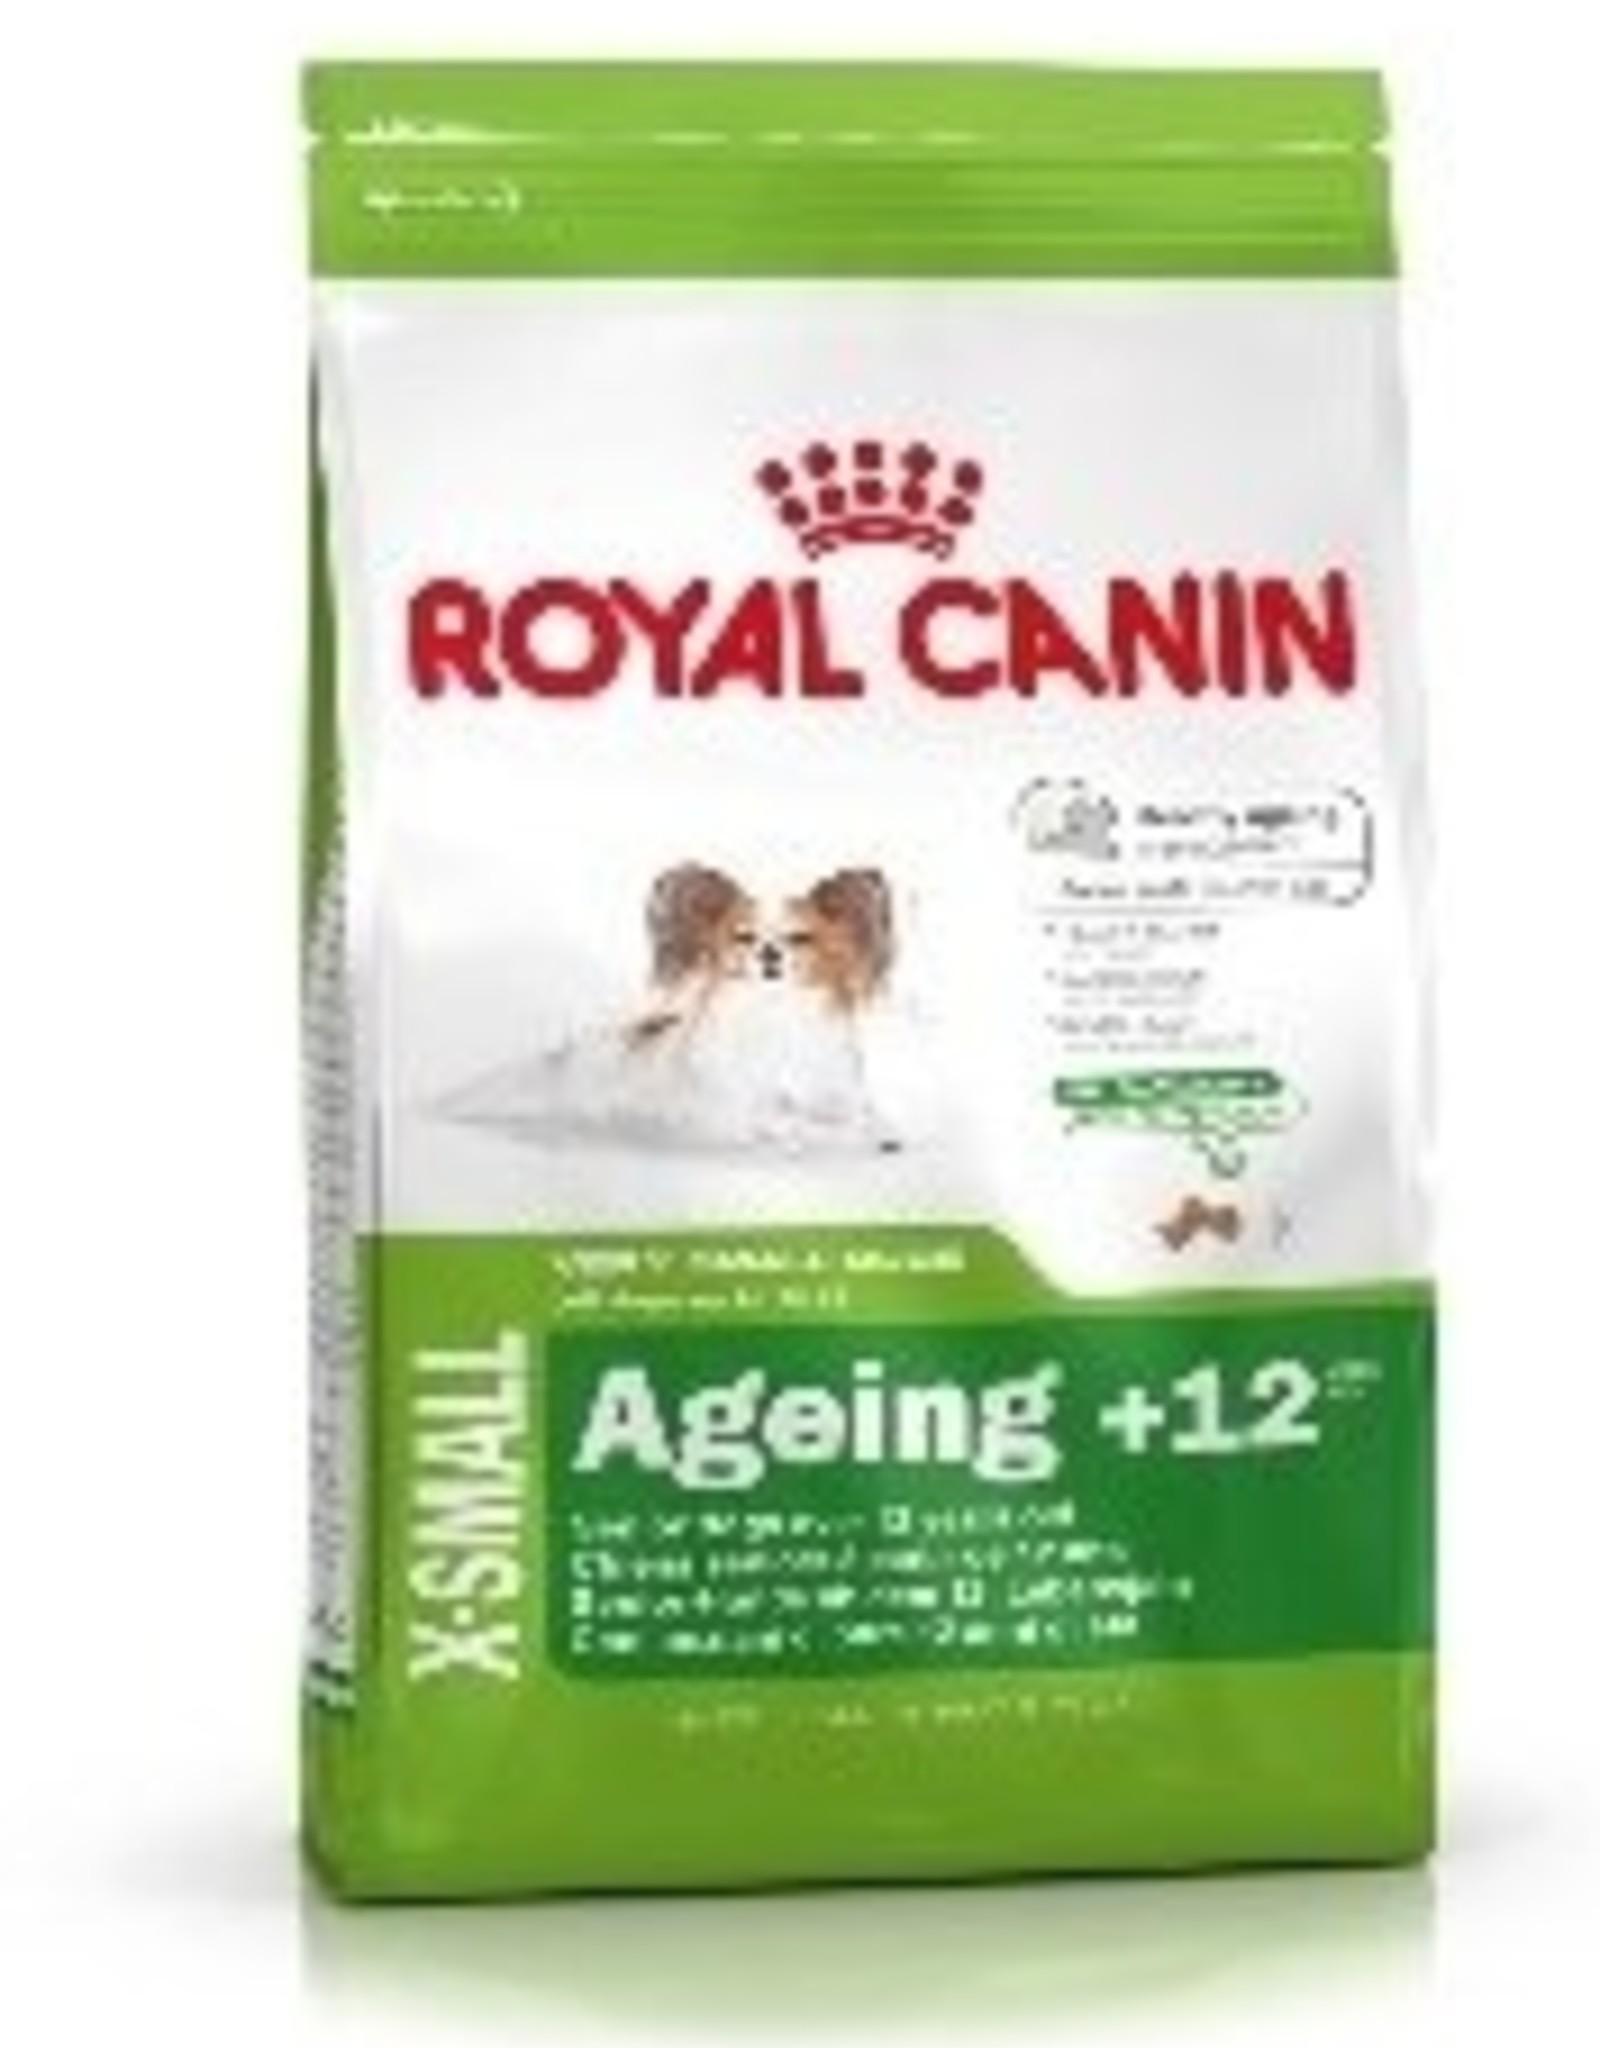 Royal Canin Royal Canin Shn X Small Mature 12+ Canine 0,5kg